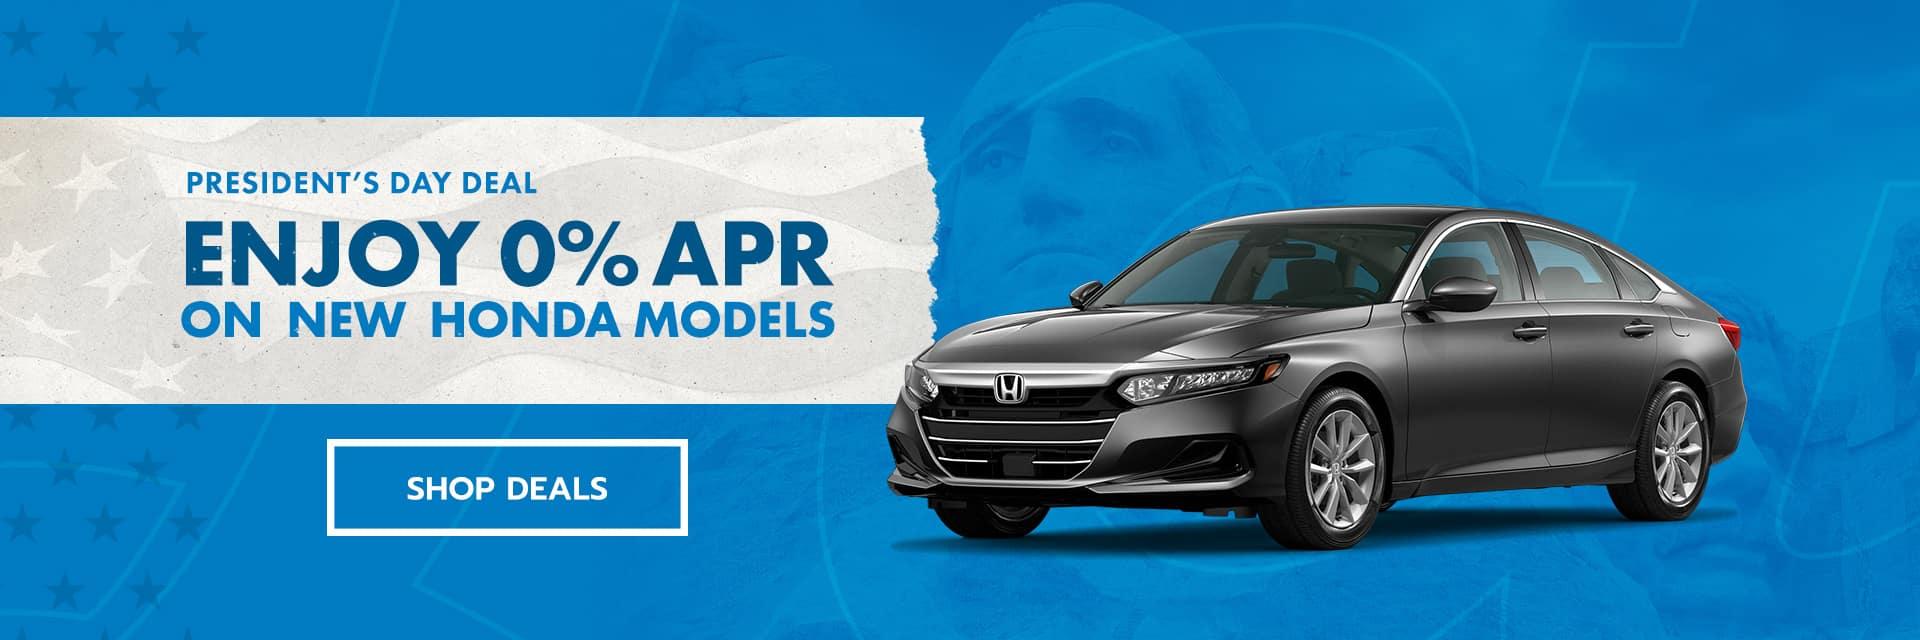 Honda dealer st louis Presidents' Day specials